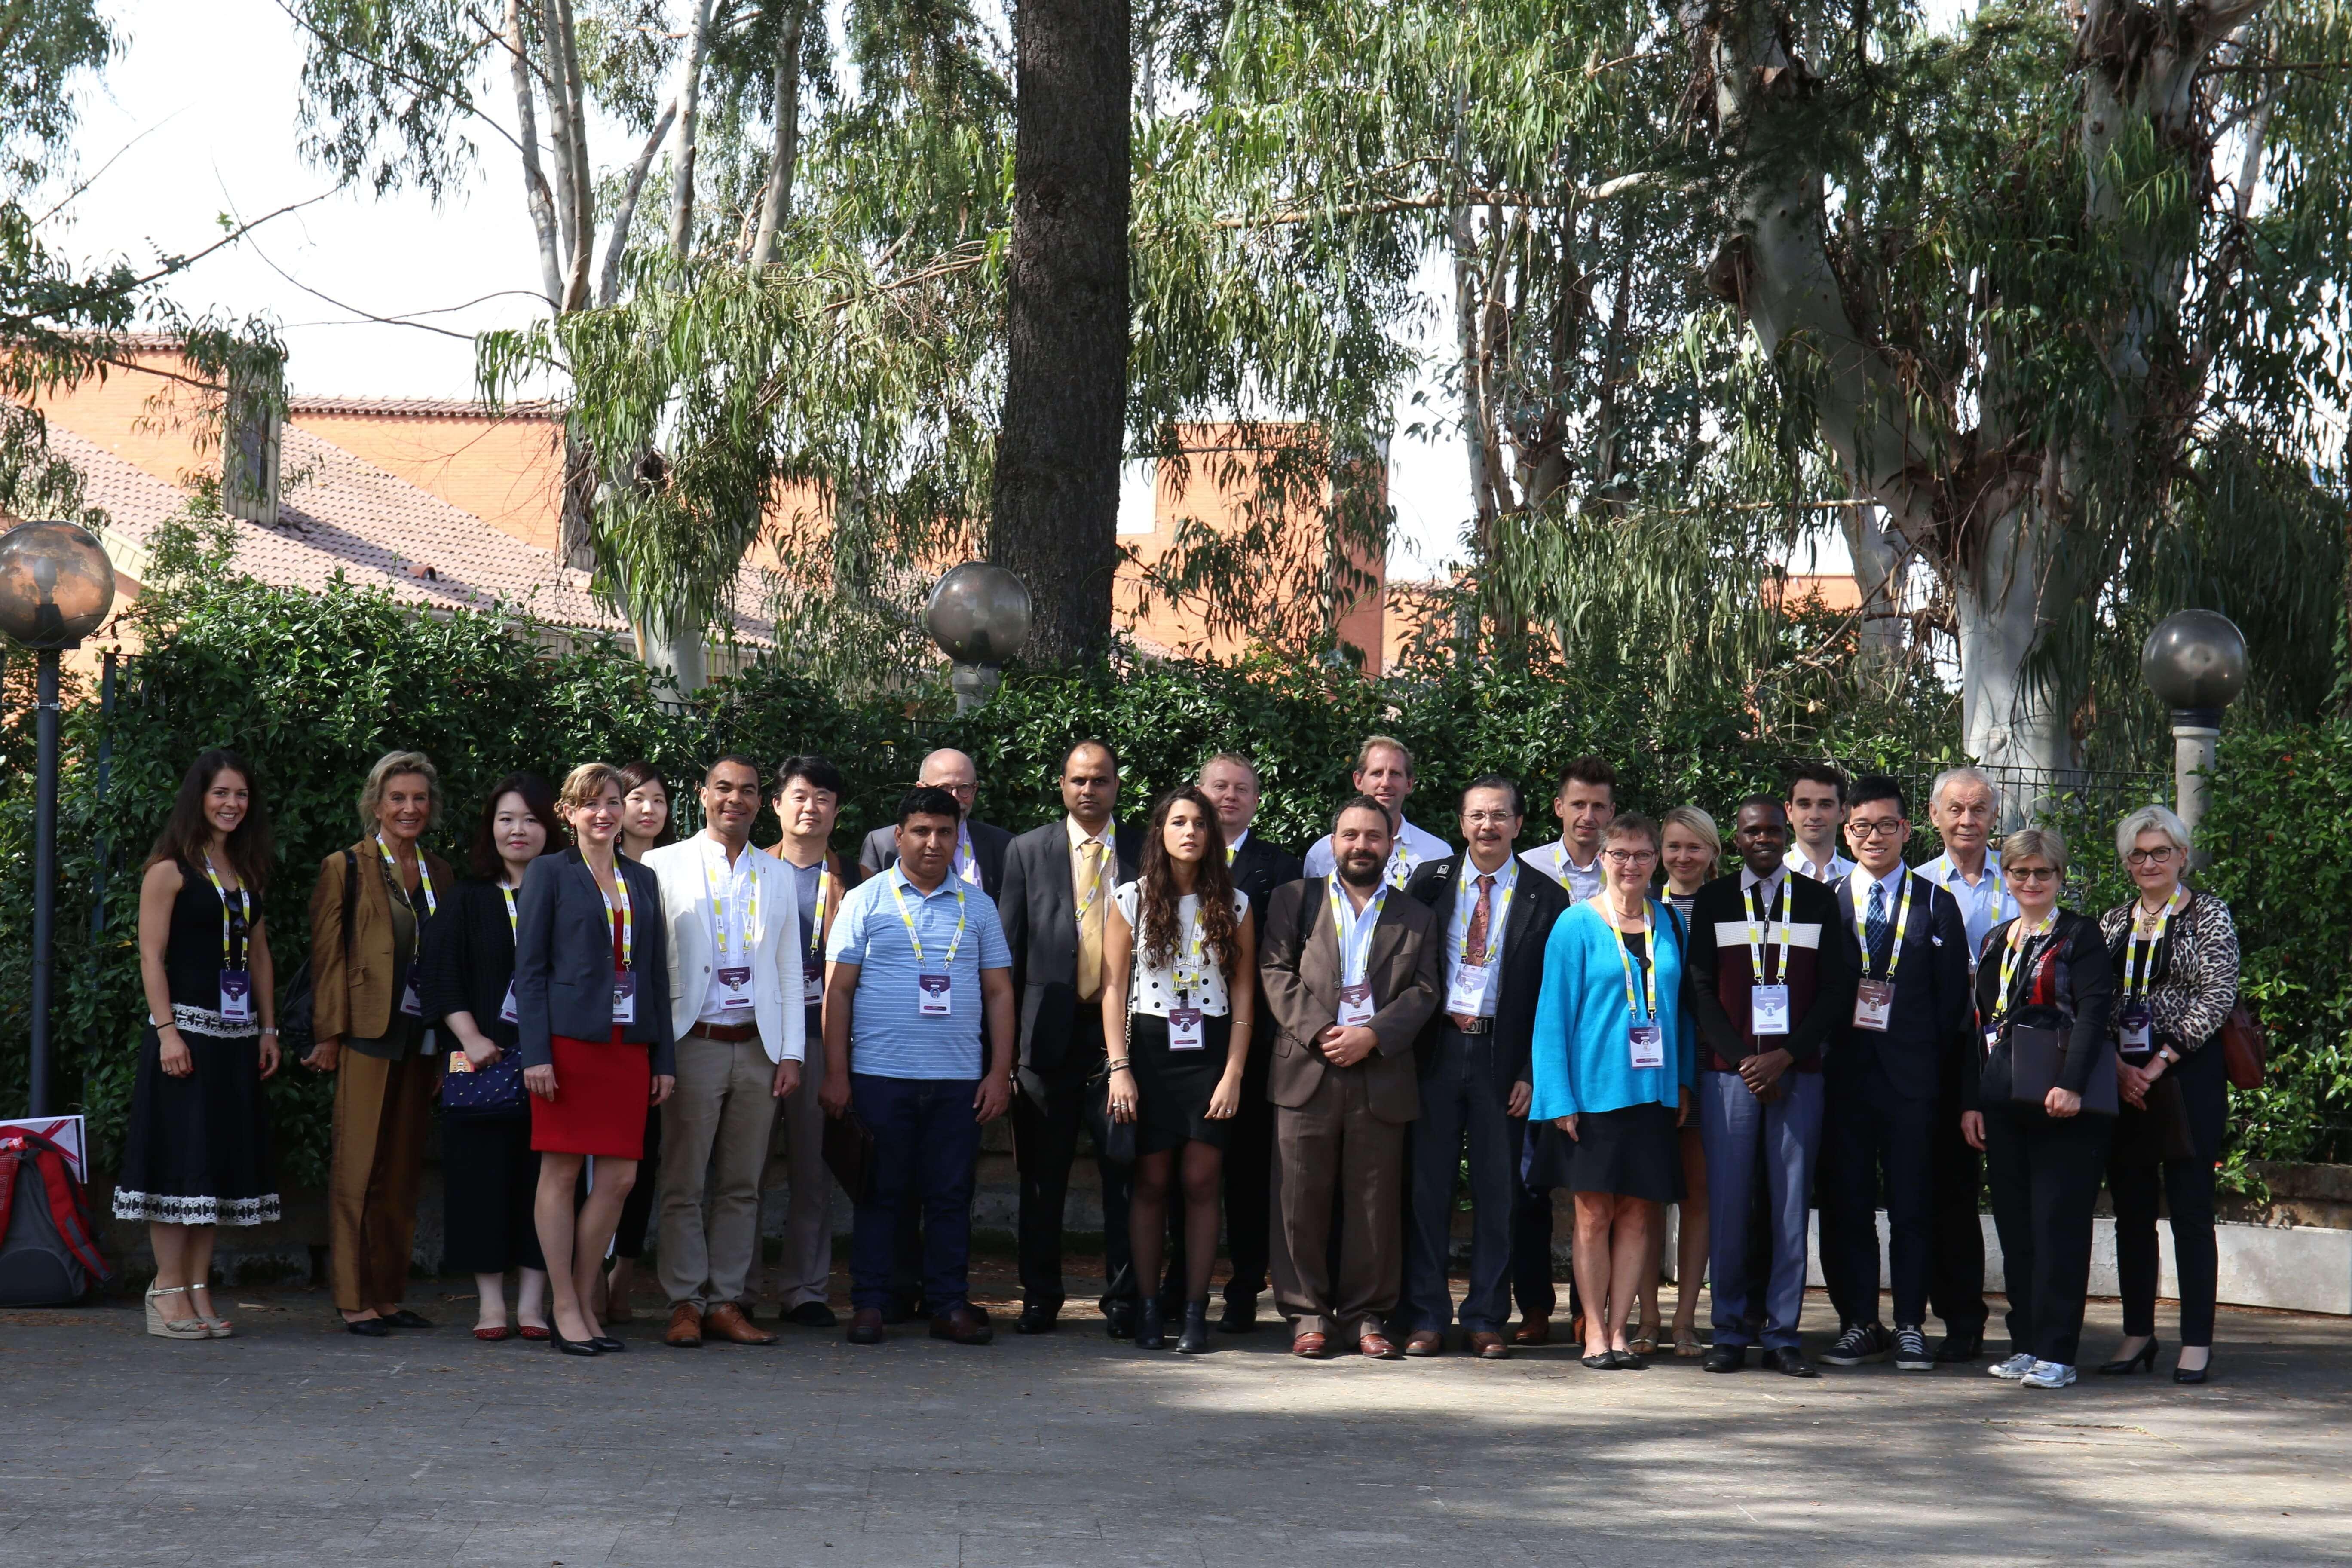 Cancer Congress - ICOR 2018 Group photo